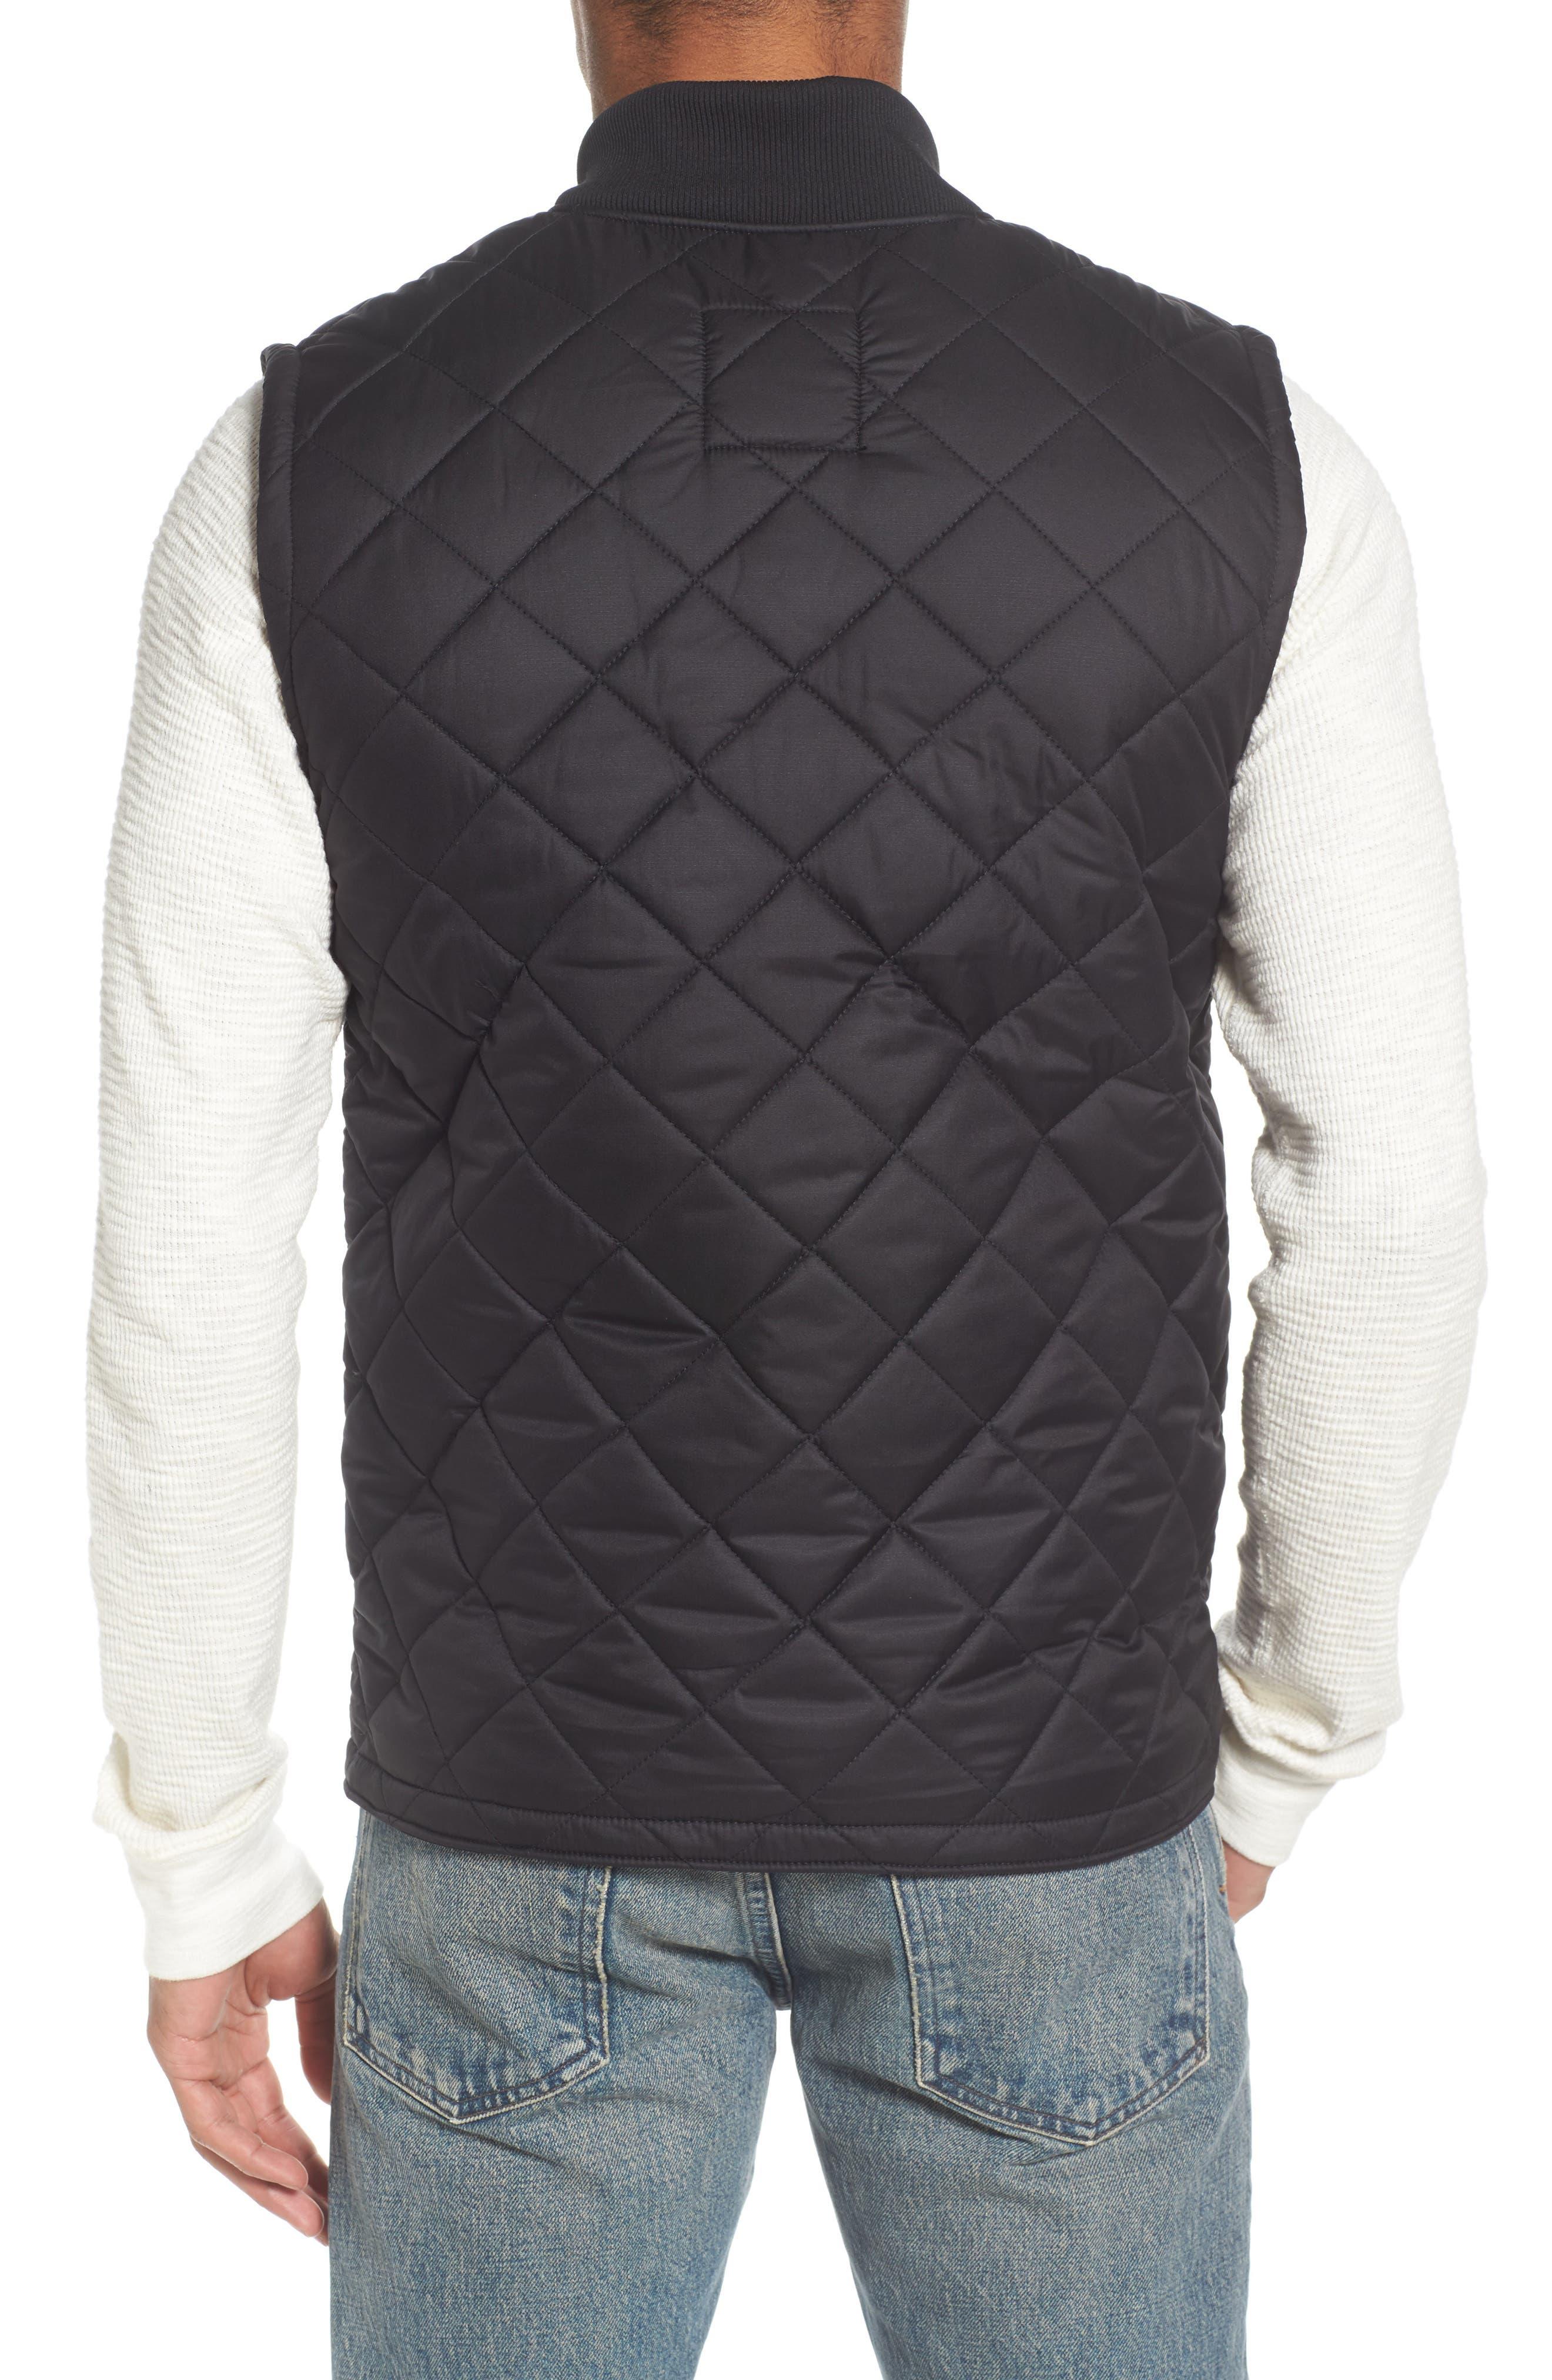 Cuchillo Insulated Vest,                             Alternate thumbnail 2, color,                             001